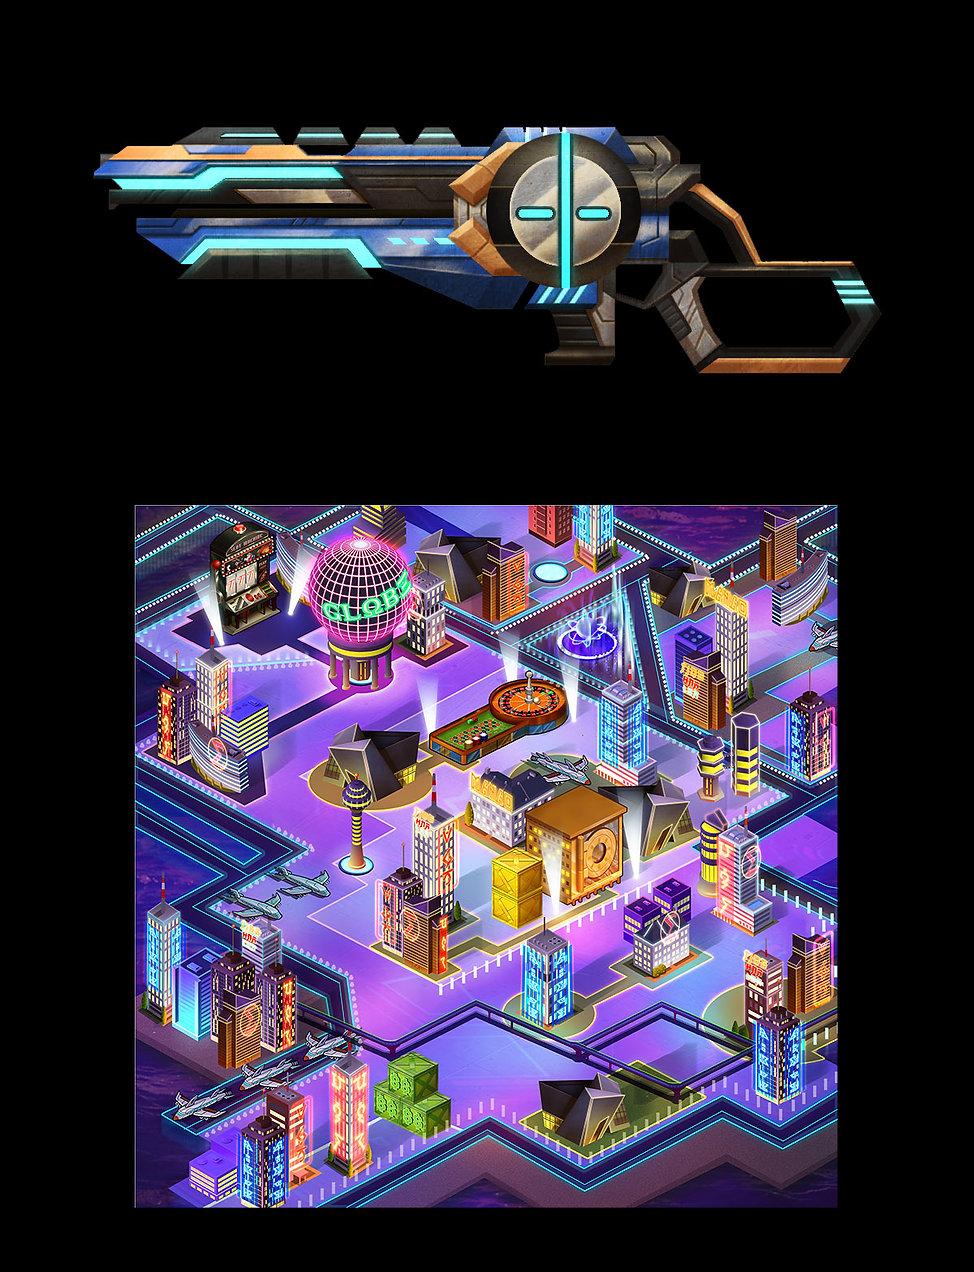 Ralpgames_art_Ultimate_Supremacy_4.jpg